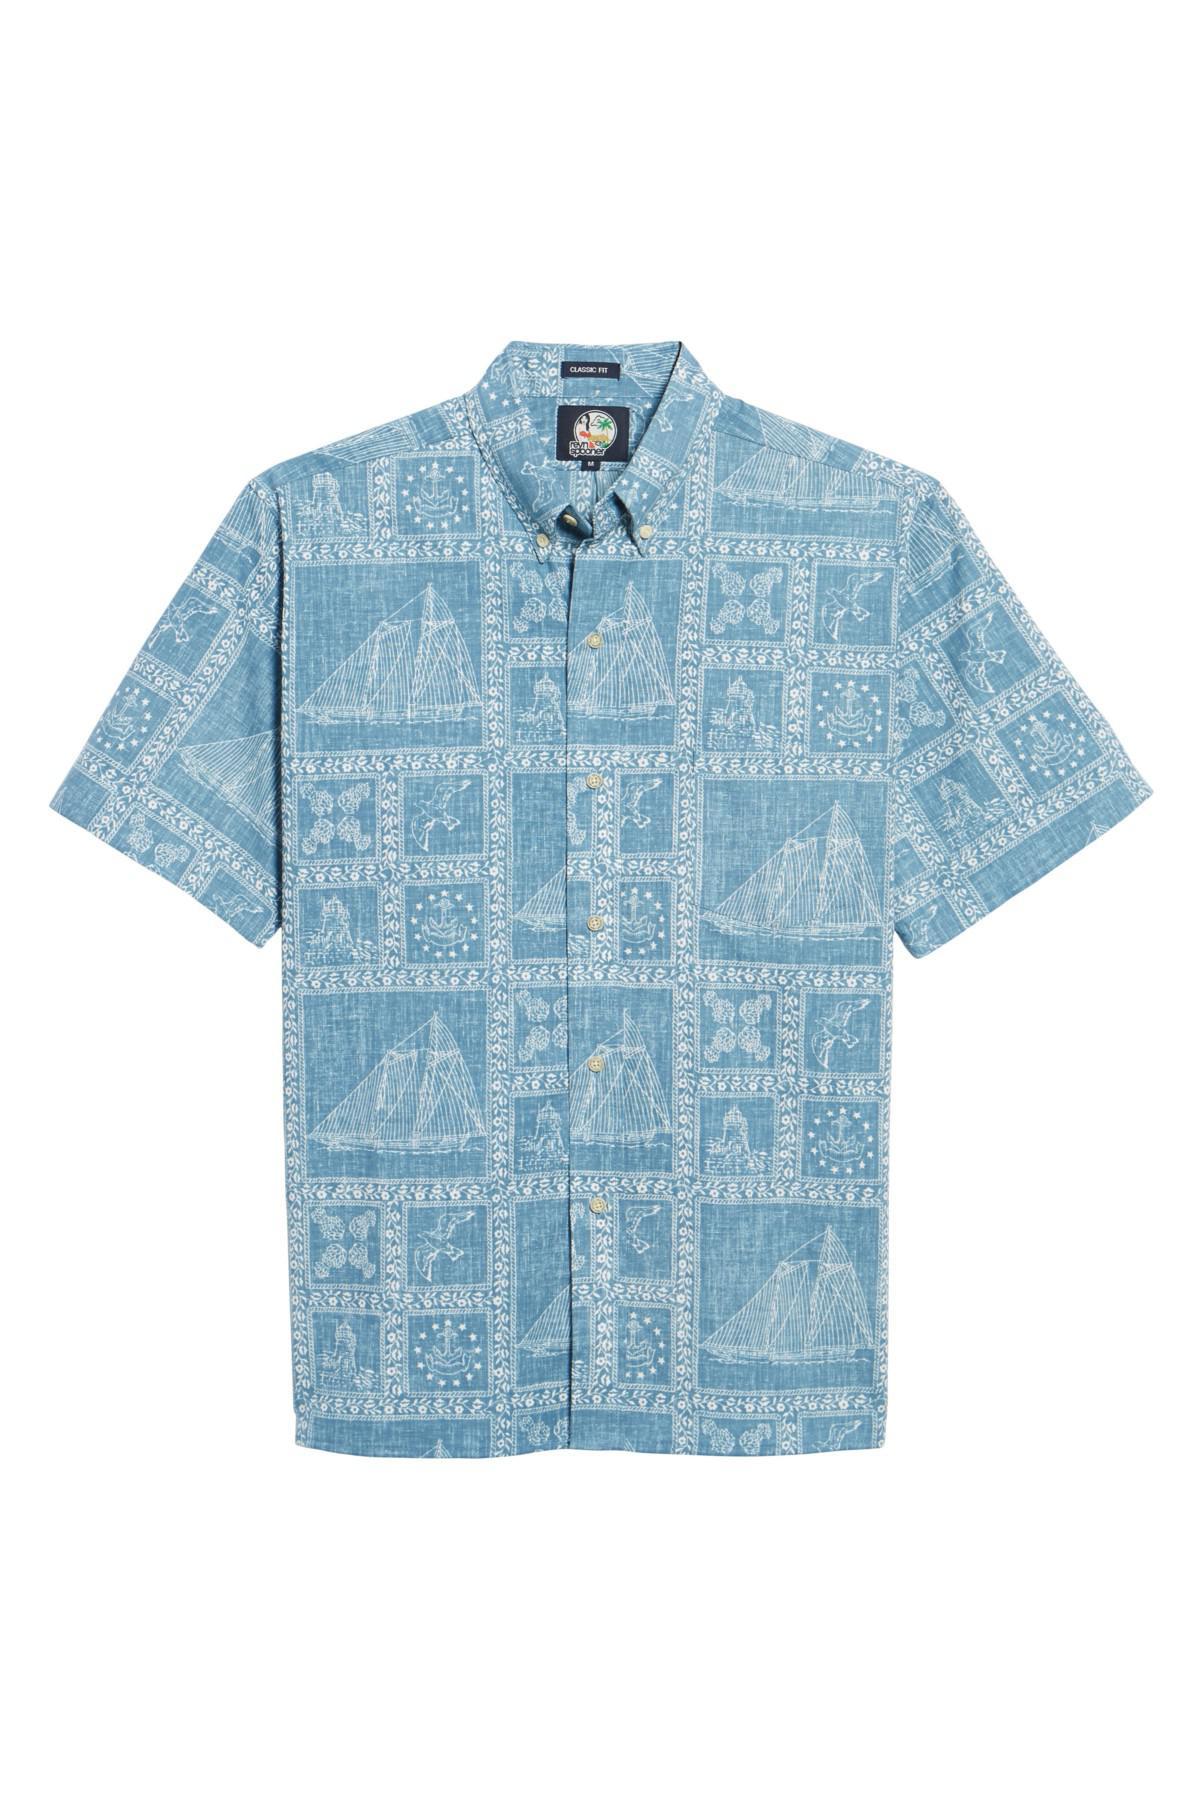 816c9458769e Lyst - Reyn Spooner Newport Sailor Classic Fit Print Sport Shirt in ...